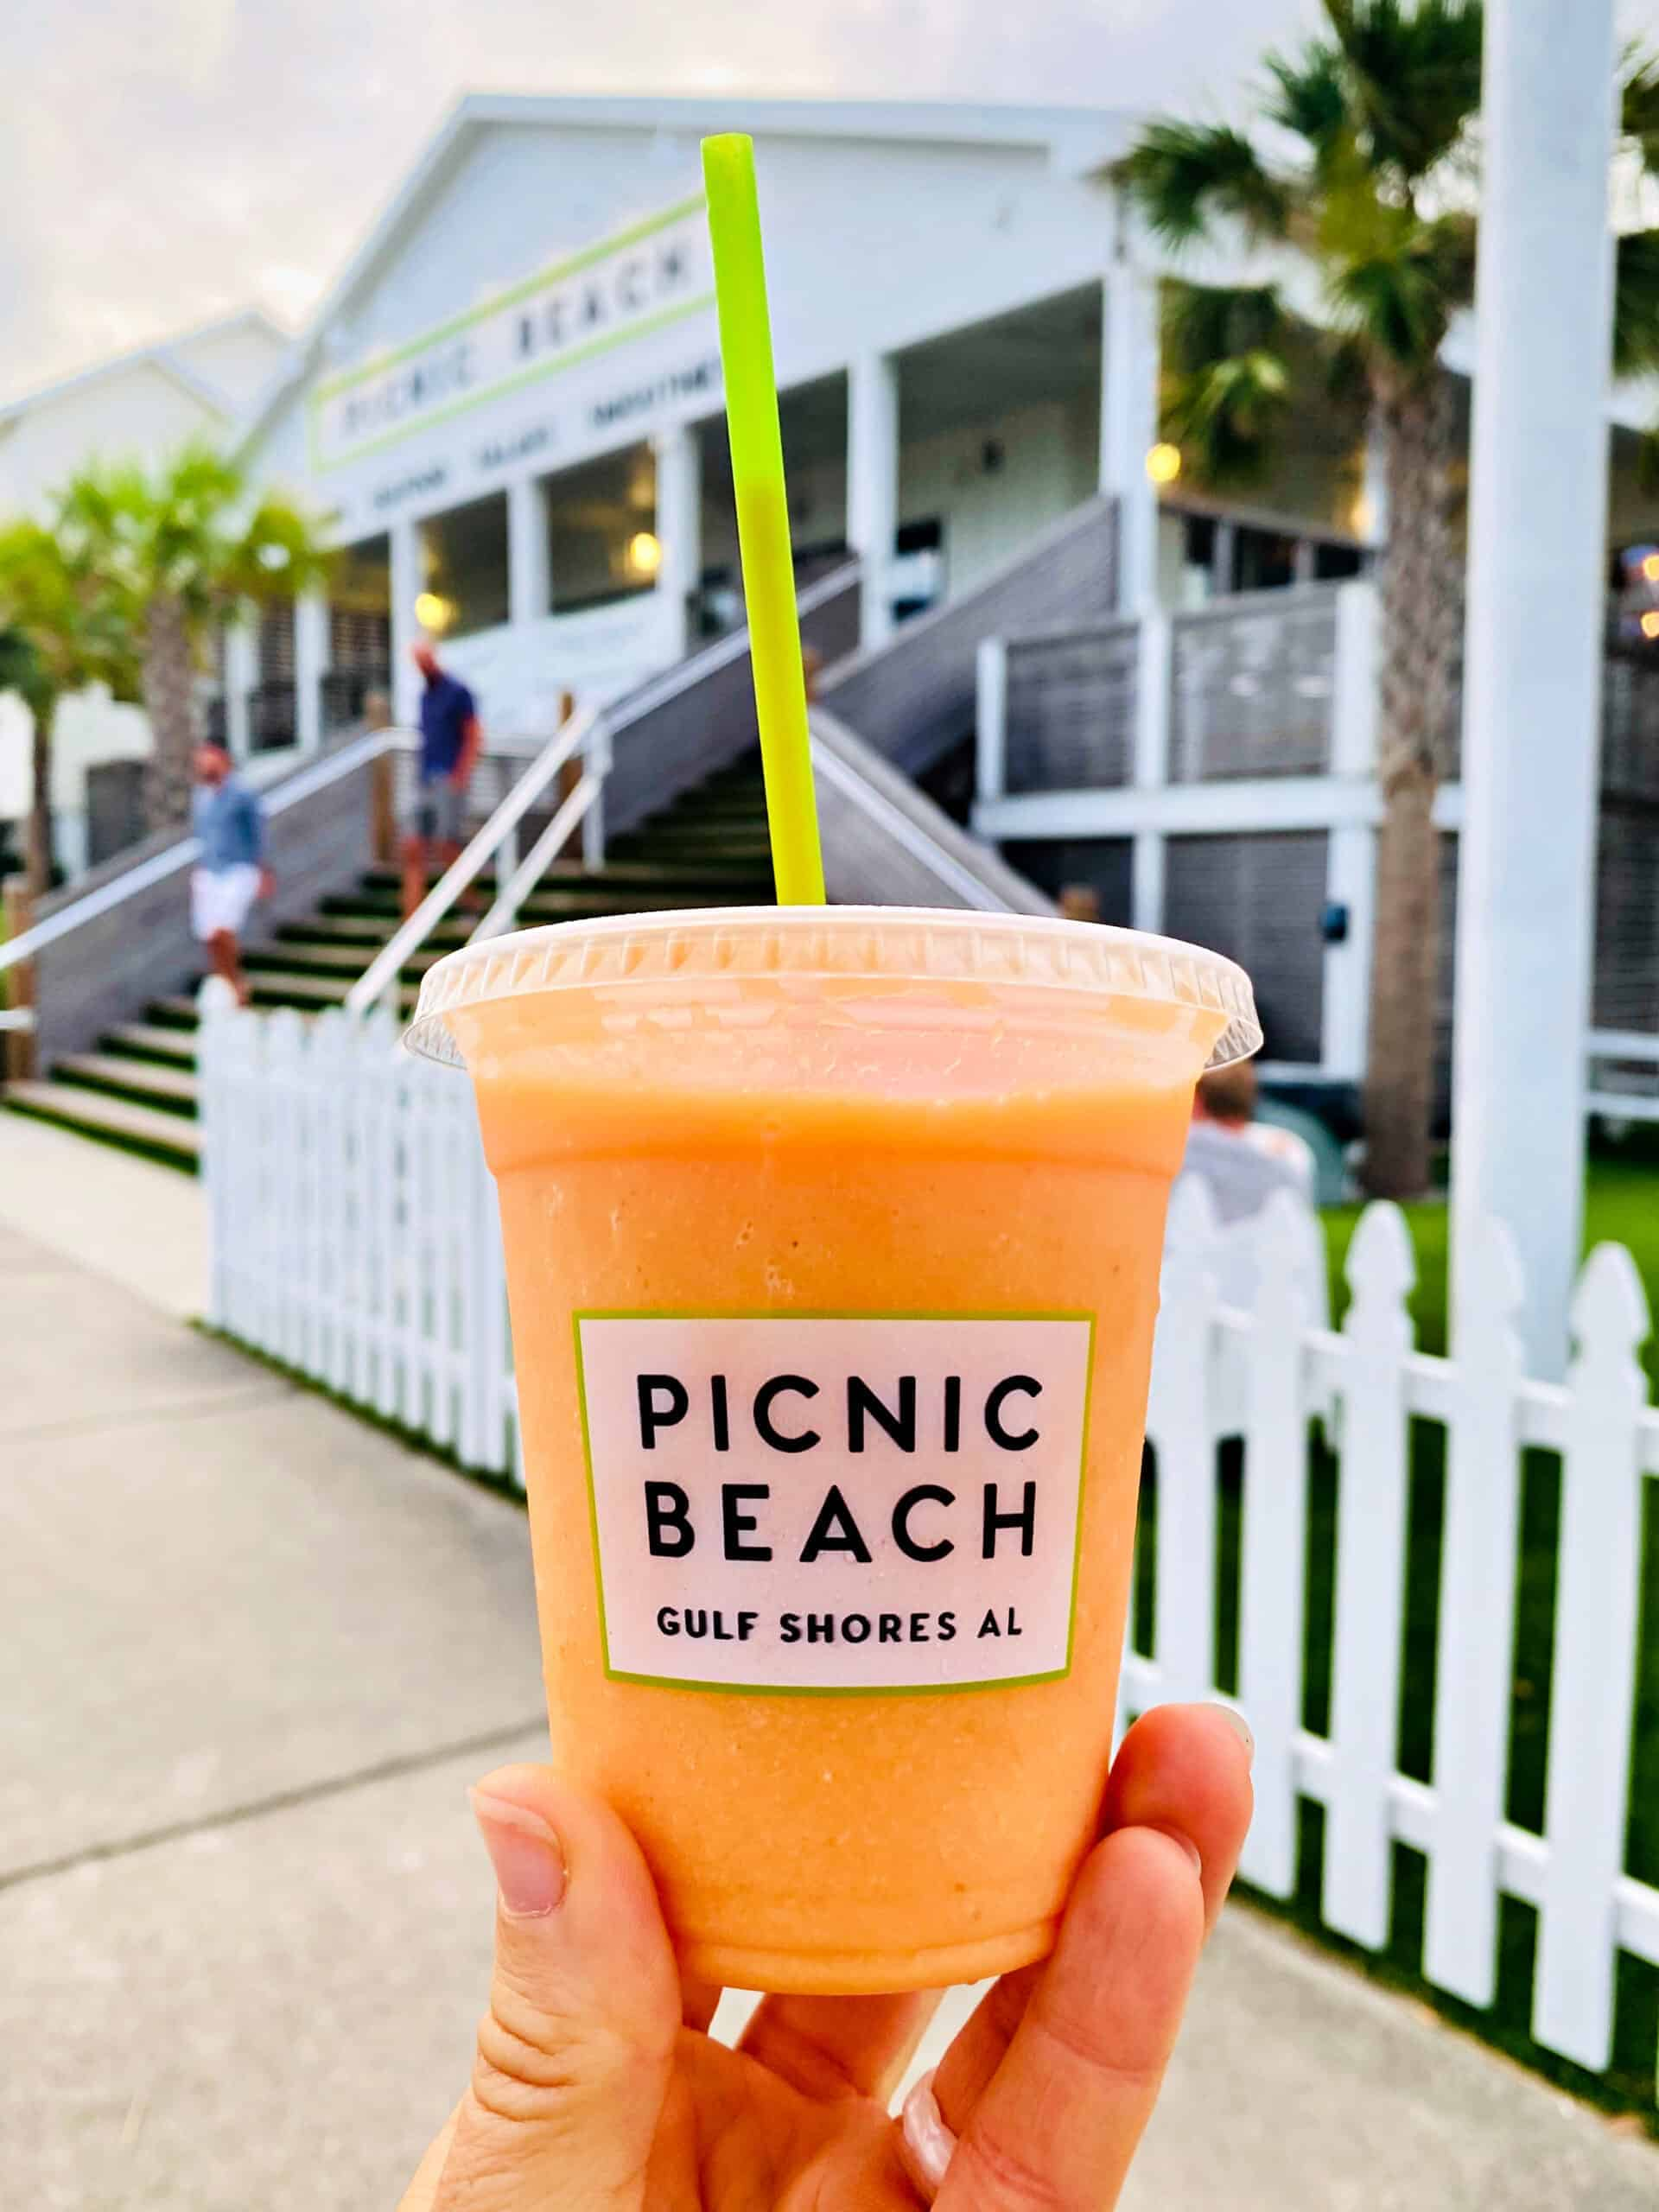 Bama Breeze Smoothie at Picnic Beach